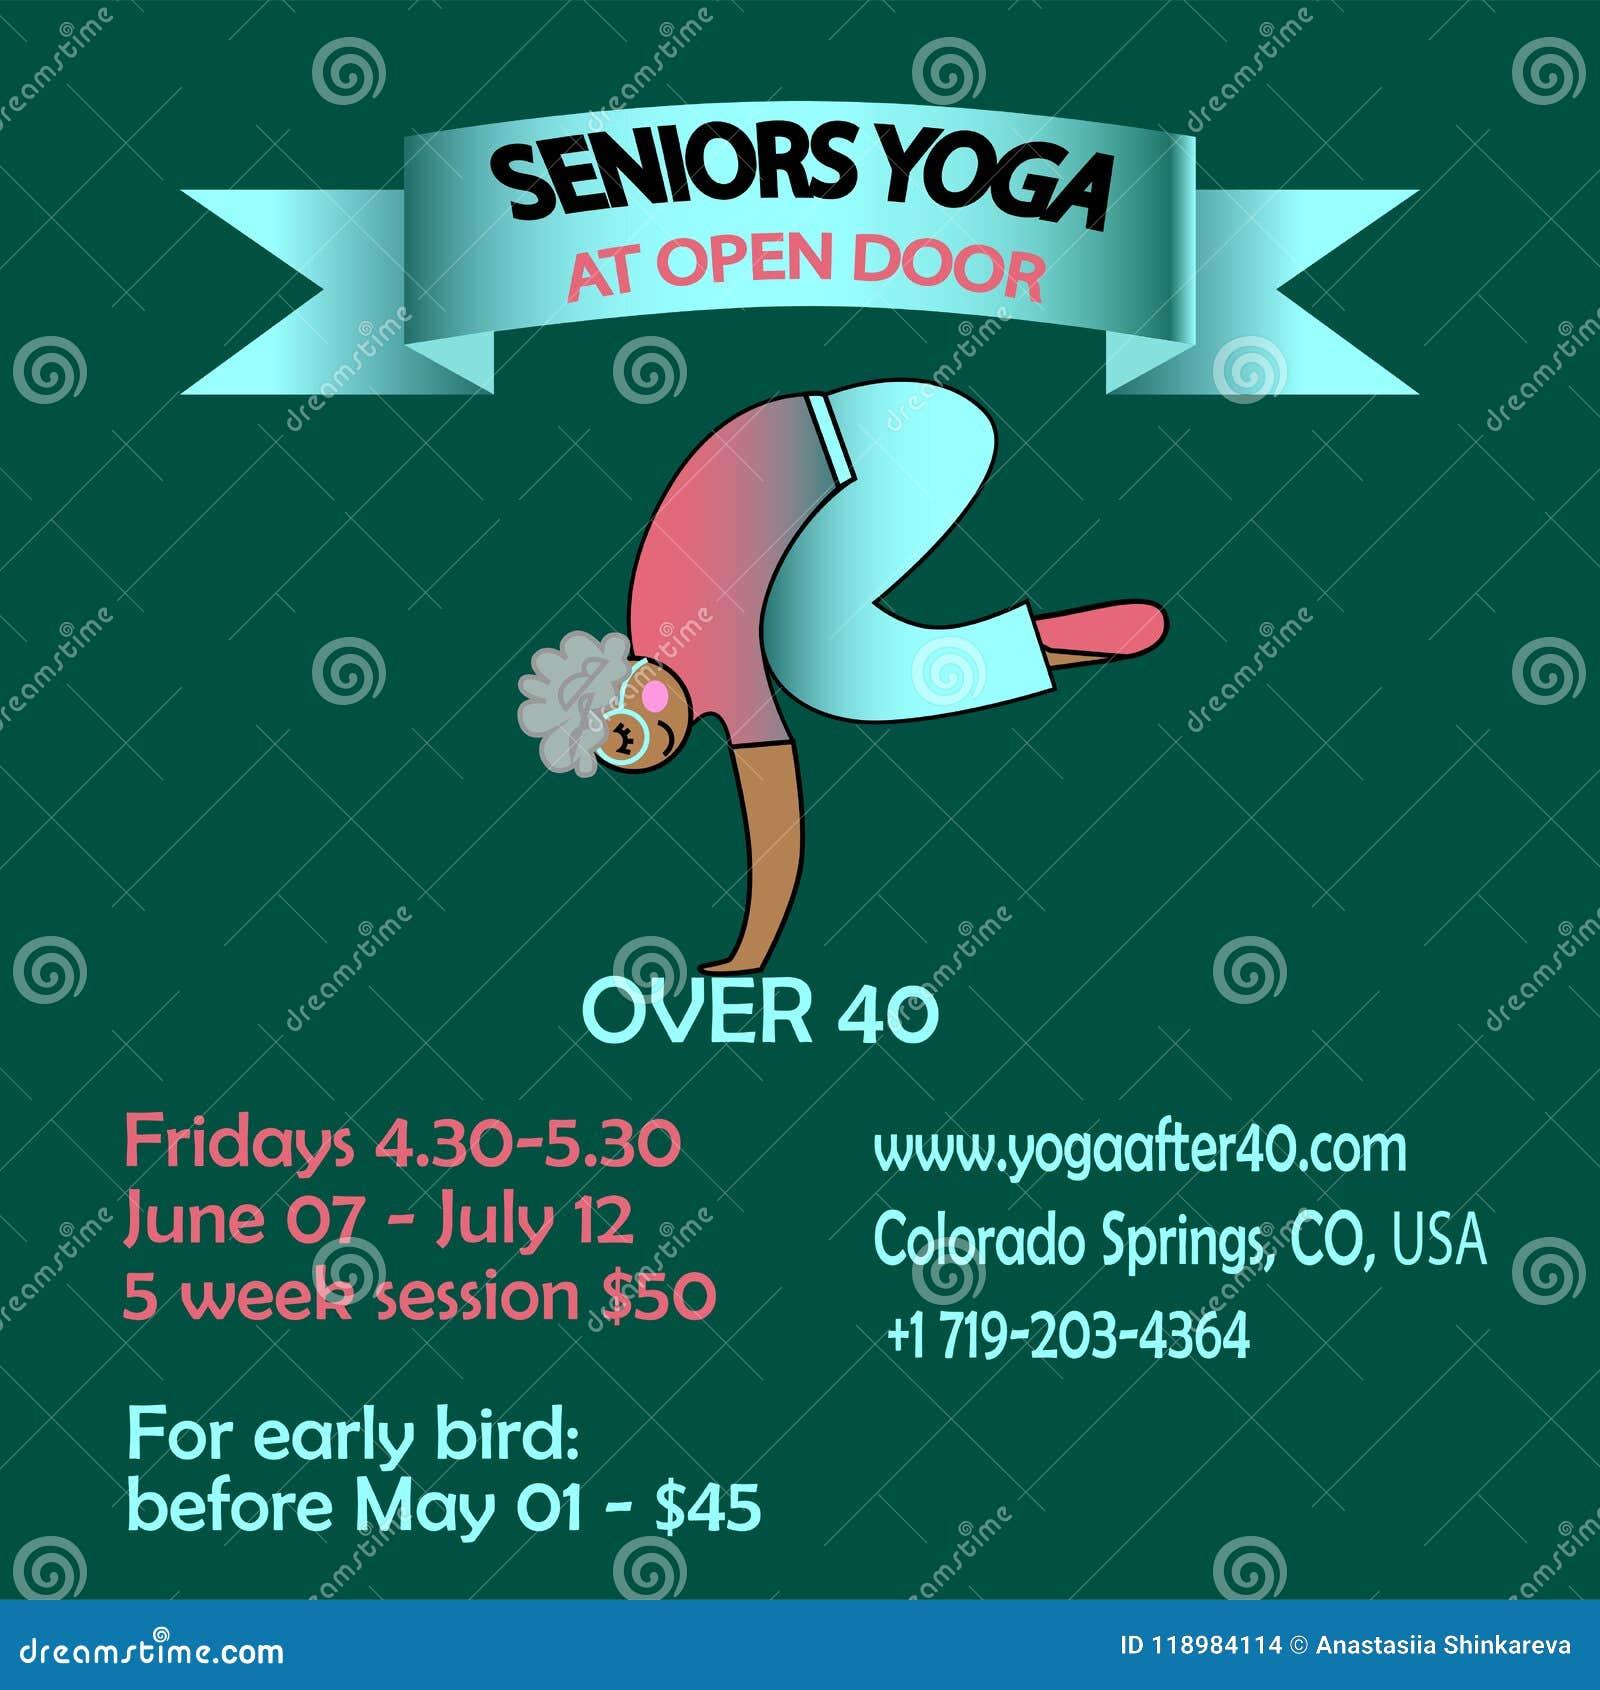 Banner Poster For Training Of Seniors Yoga Stock Vector Illustration Of Sport Active 118984114